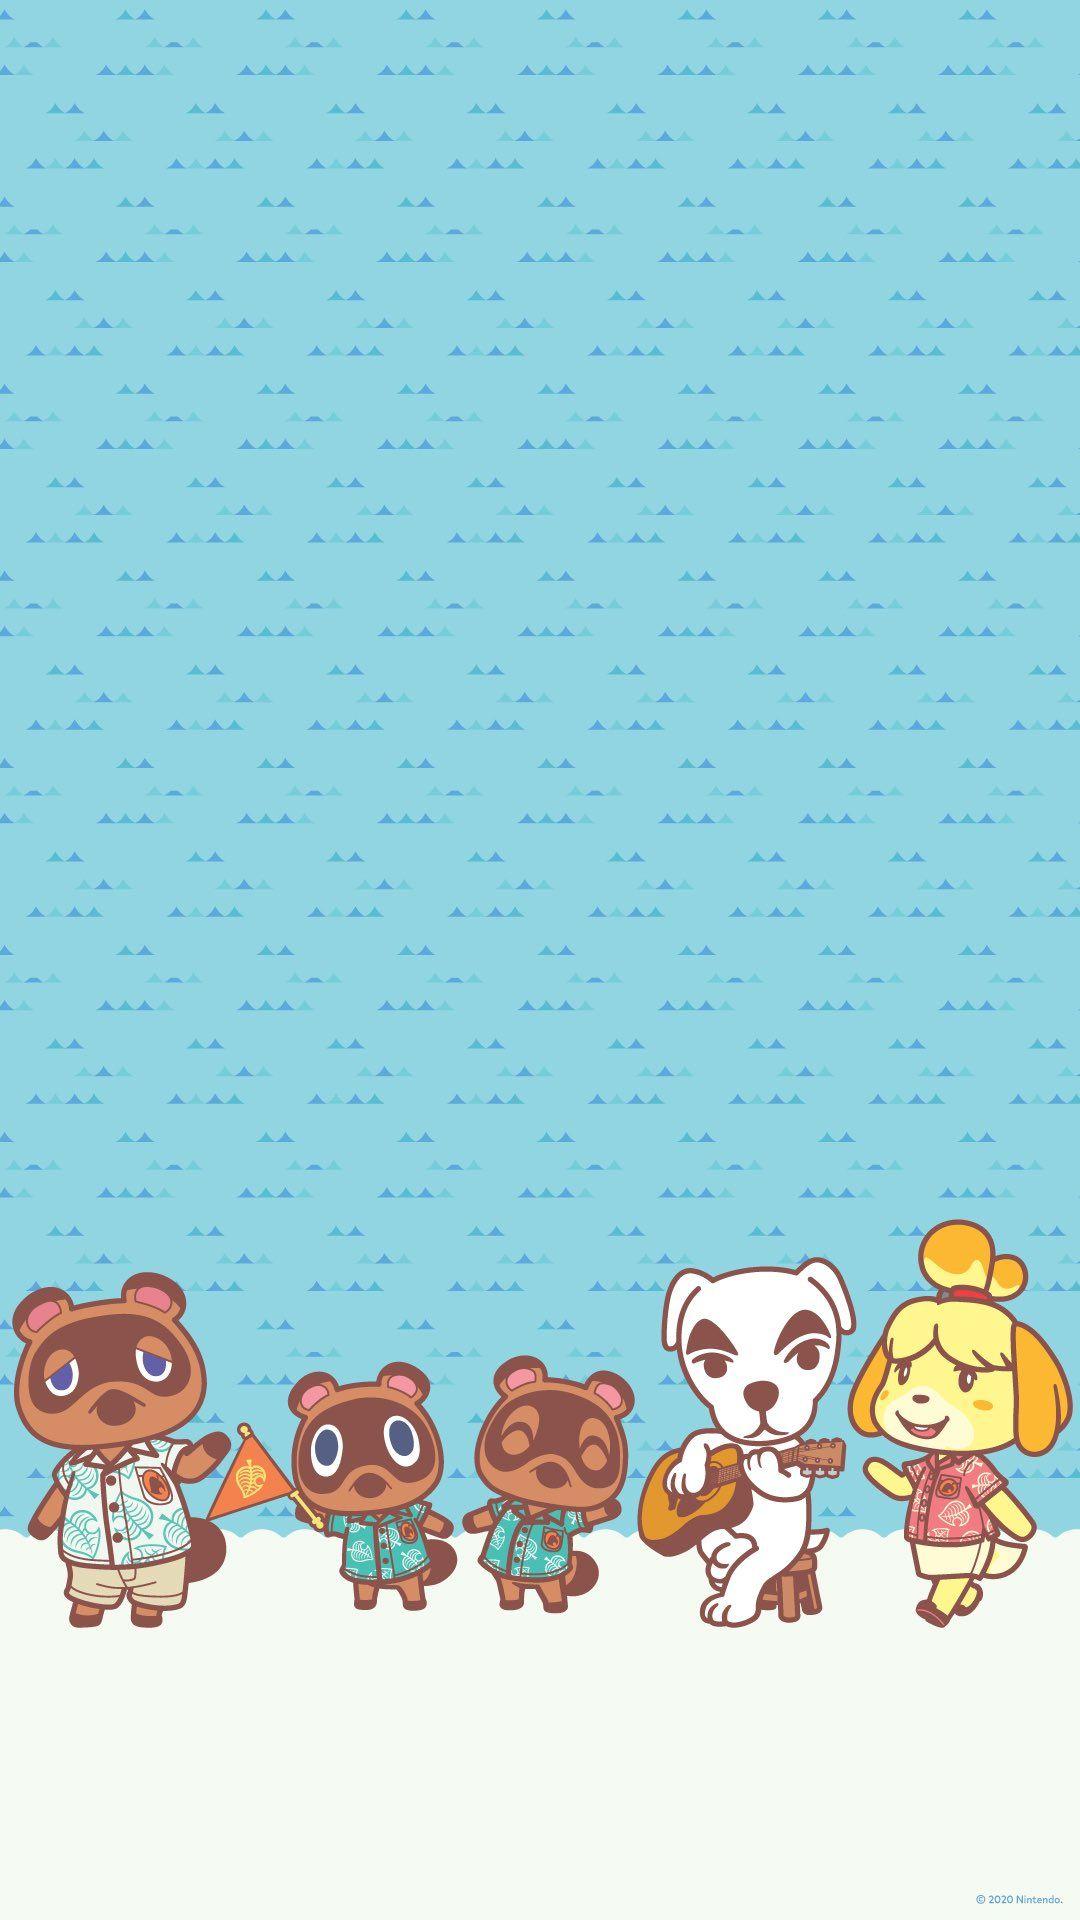 Marissa On Twitter Animal Crossing Characters Animal Crossing Fan Art Animal Crossing Game